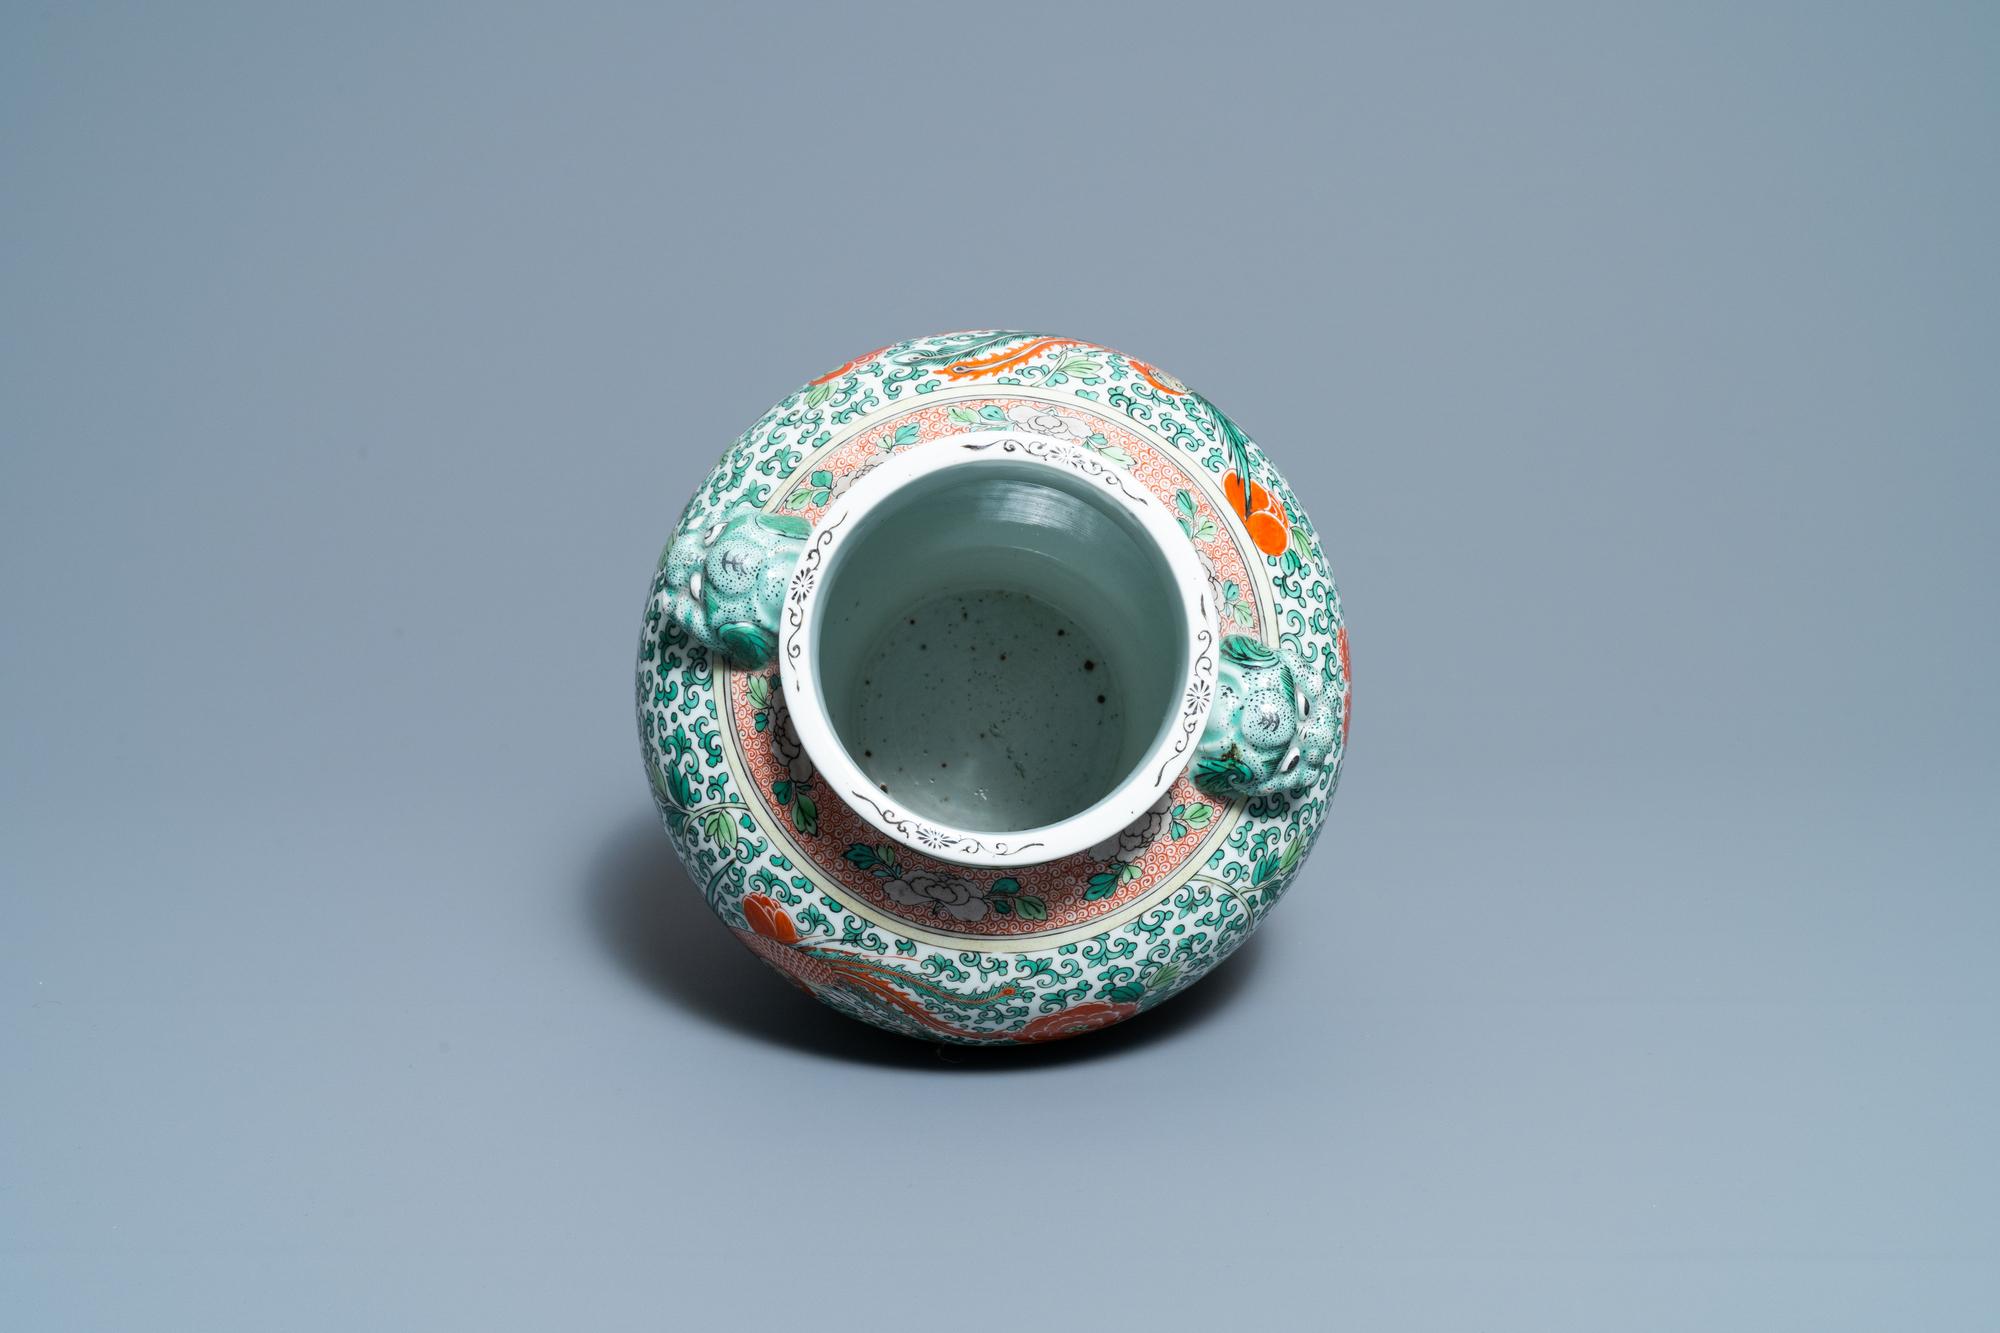 A Chinese 'wucai' phoenix vase, Chenghua mark, 19th C. - Image 5 of 6